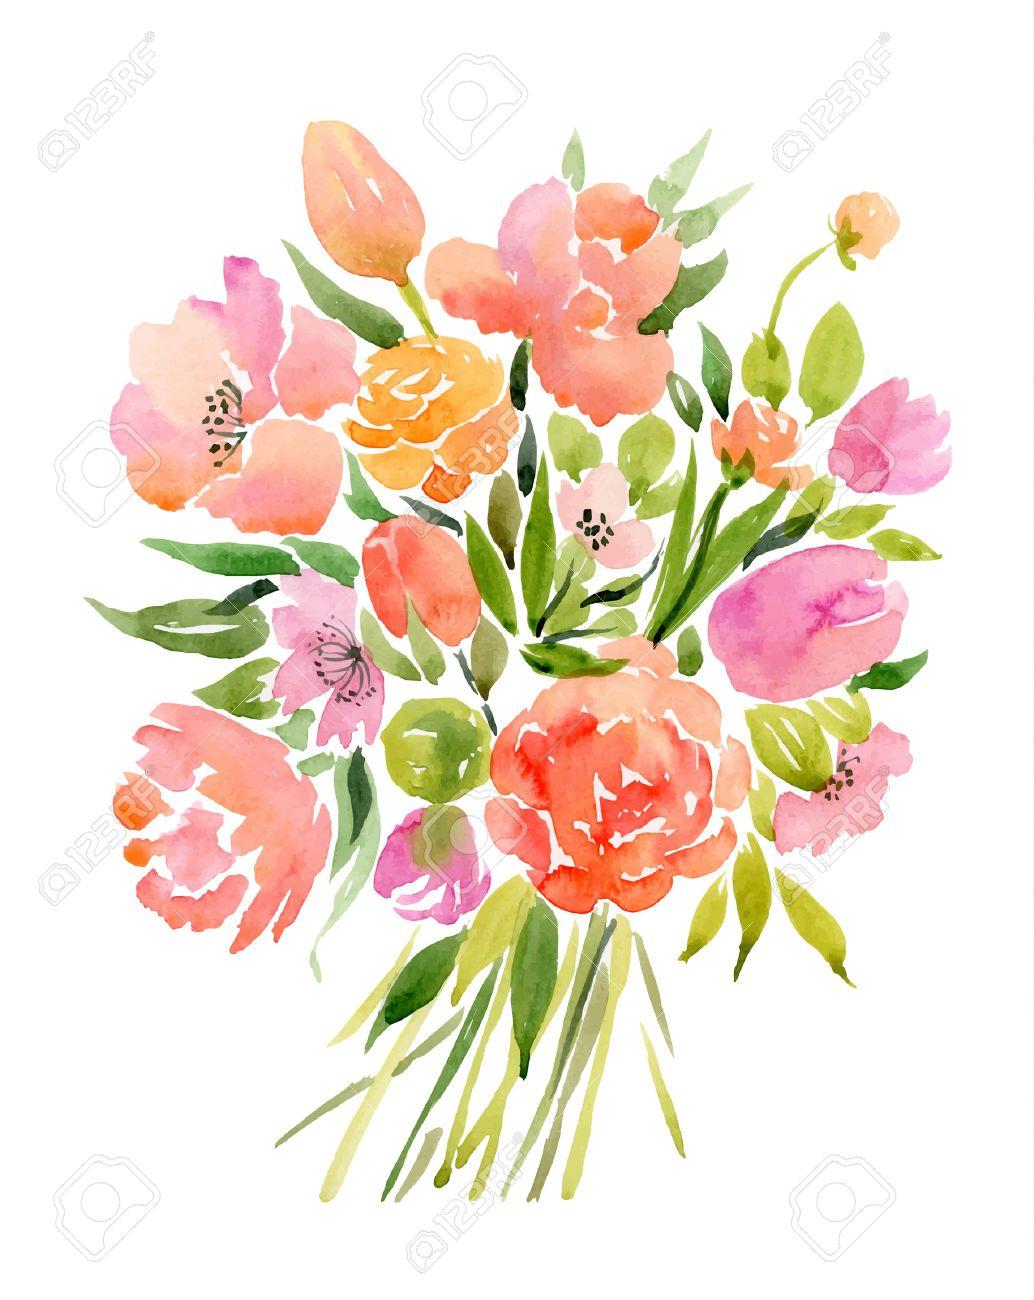 Watercolor bouquet of flowers vector illustration royalty free vector watercolor bouquet of flowers vector illustration izmirmasajfo Gallery